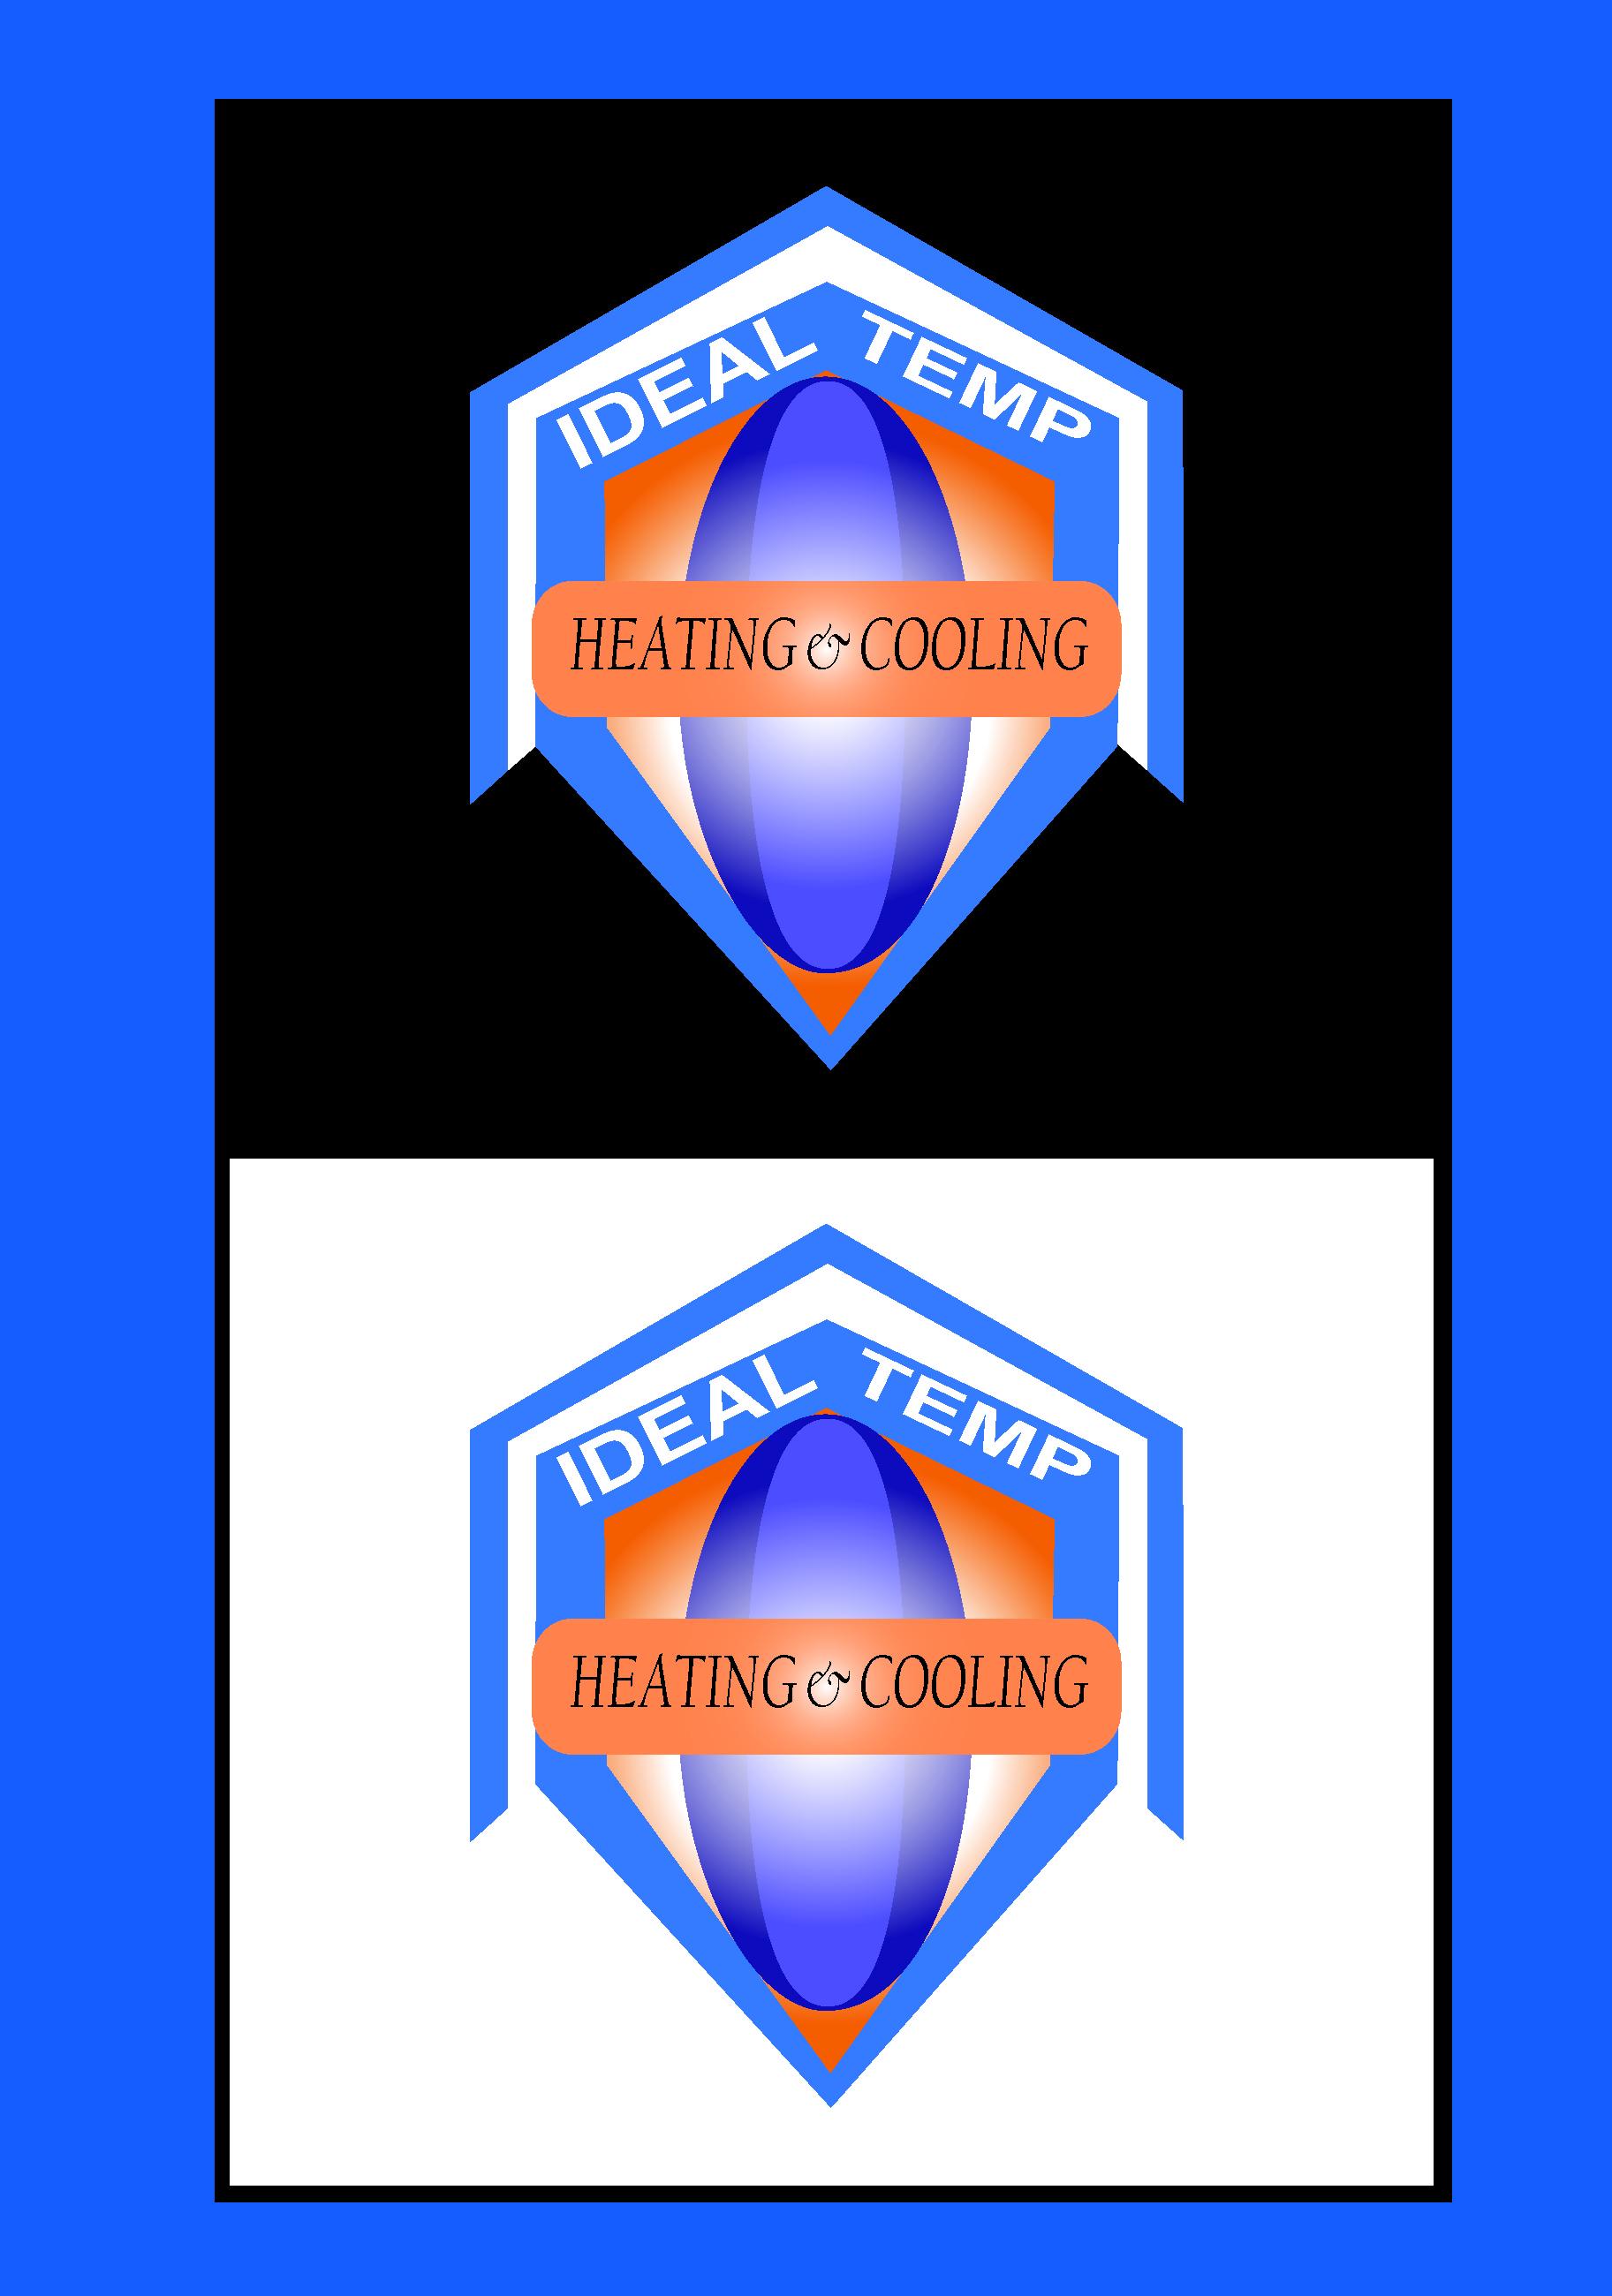 Logo Design by Shankar Halder - Entry No. 29 in the Logo Design Contest Captivating Logo Design for Ideal Temp.